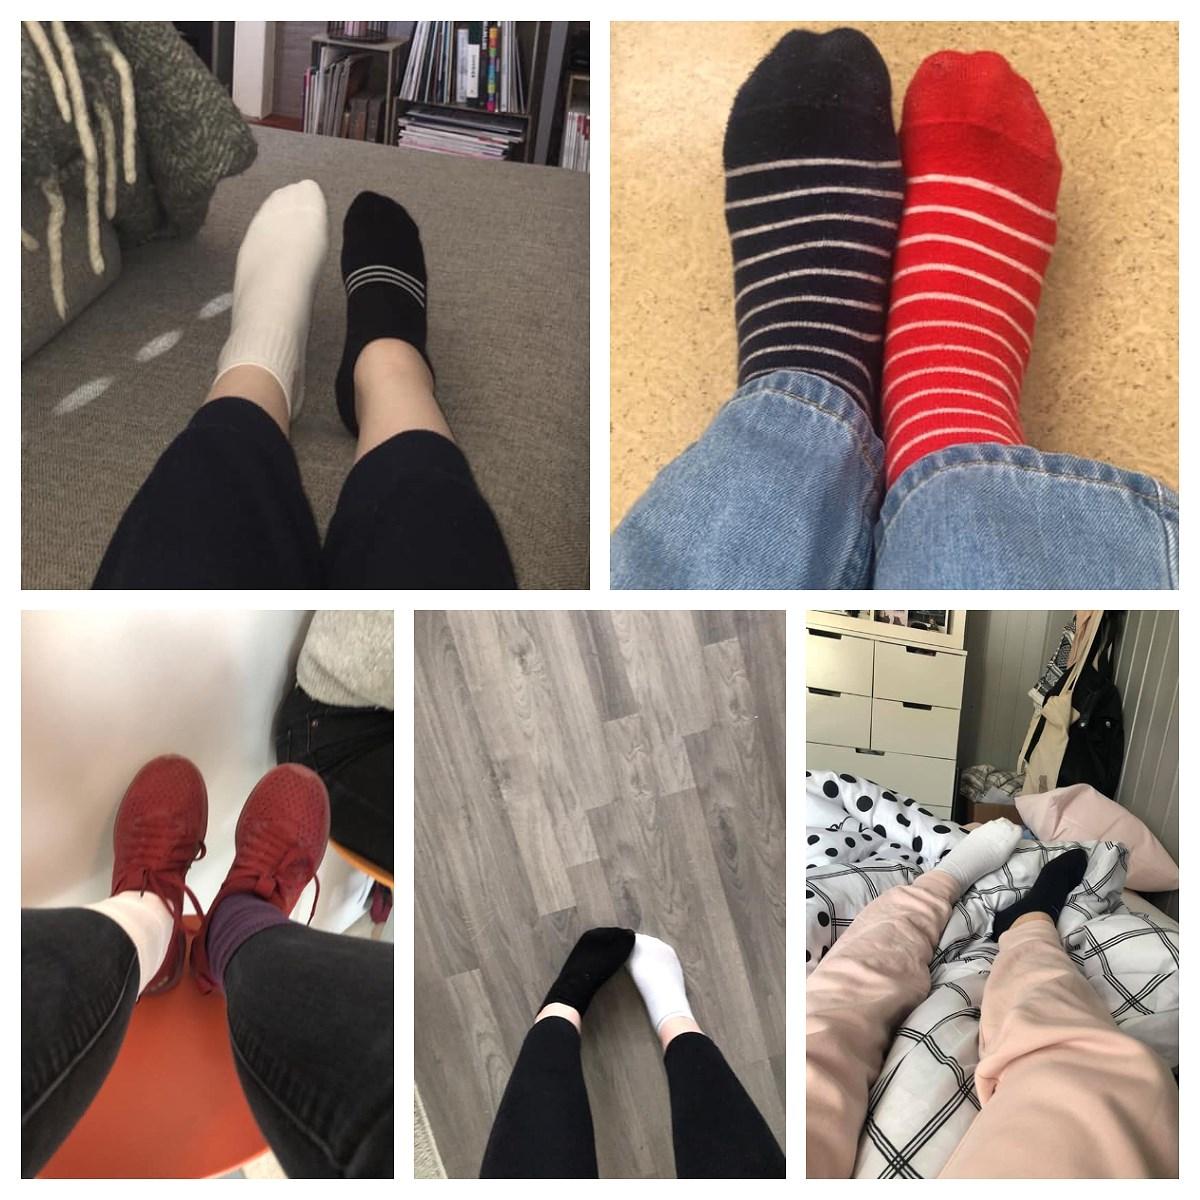 La oss rocke sokkene!